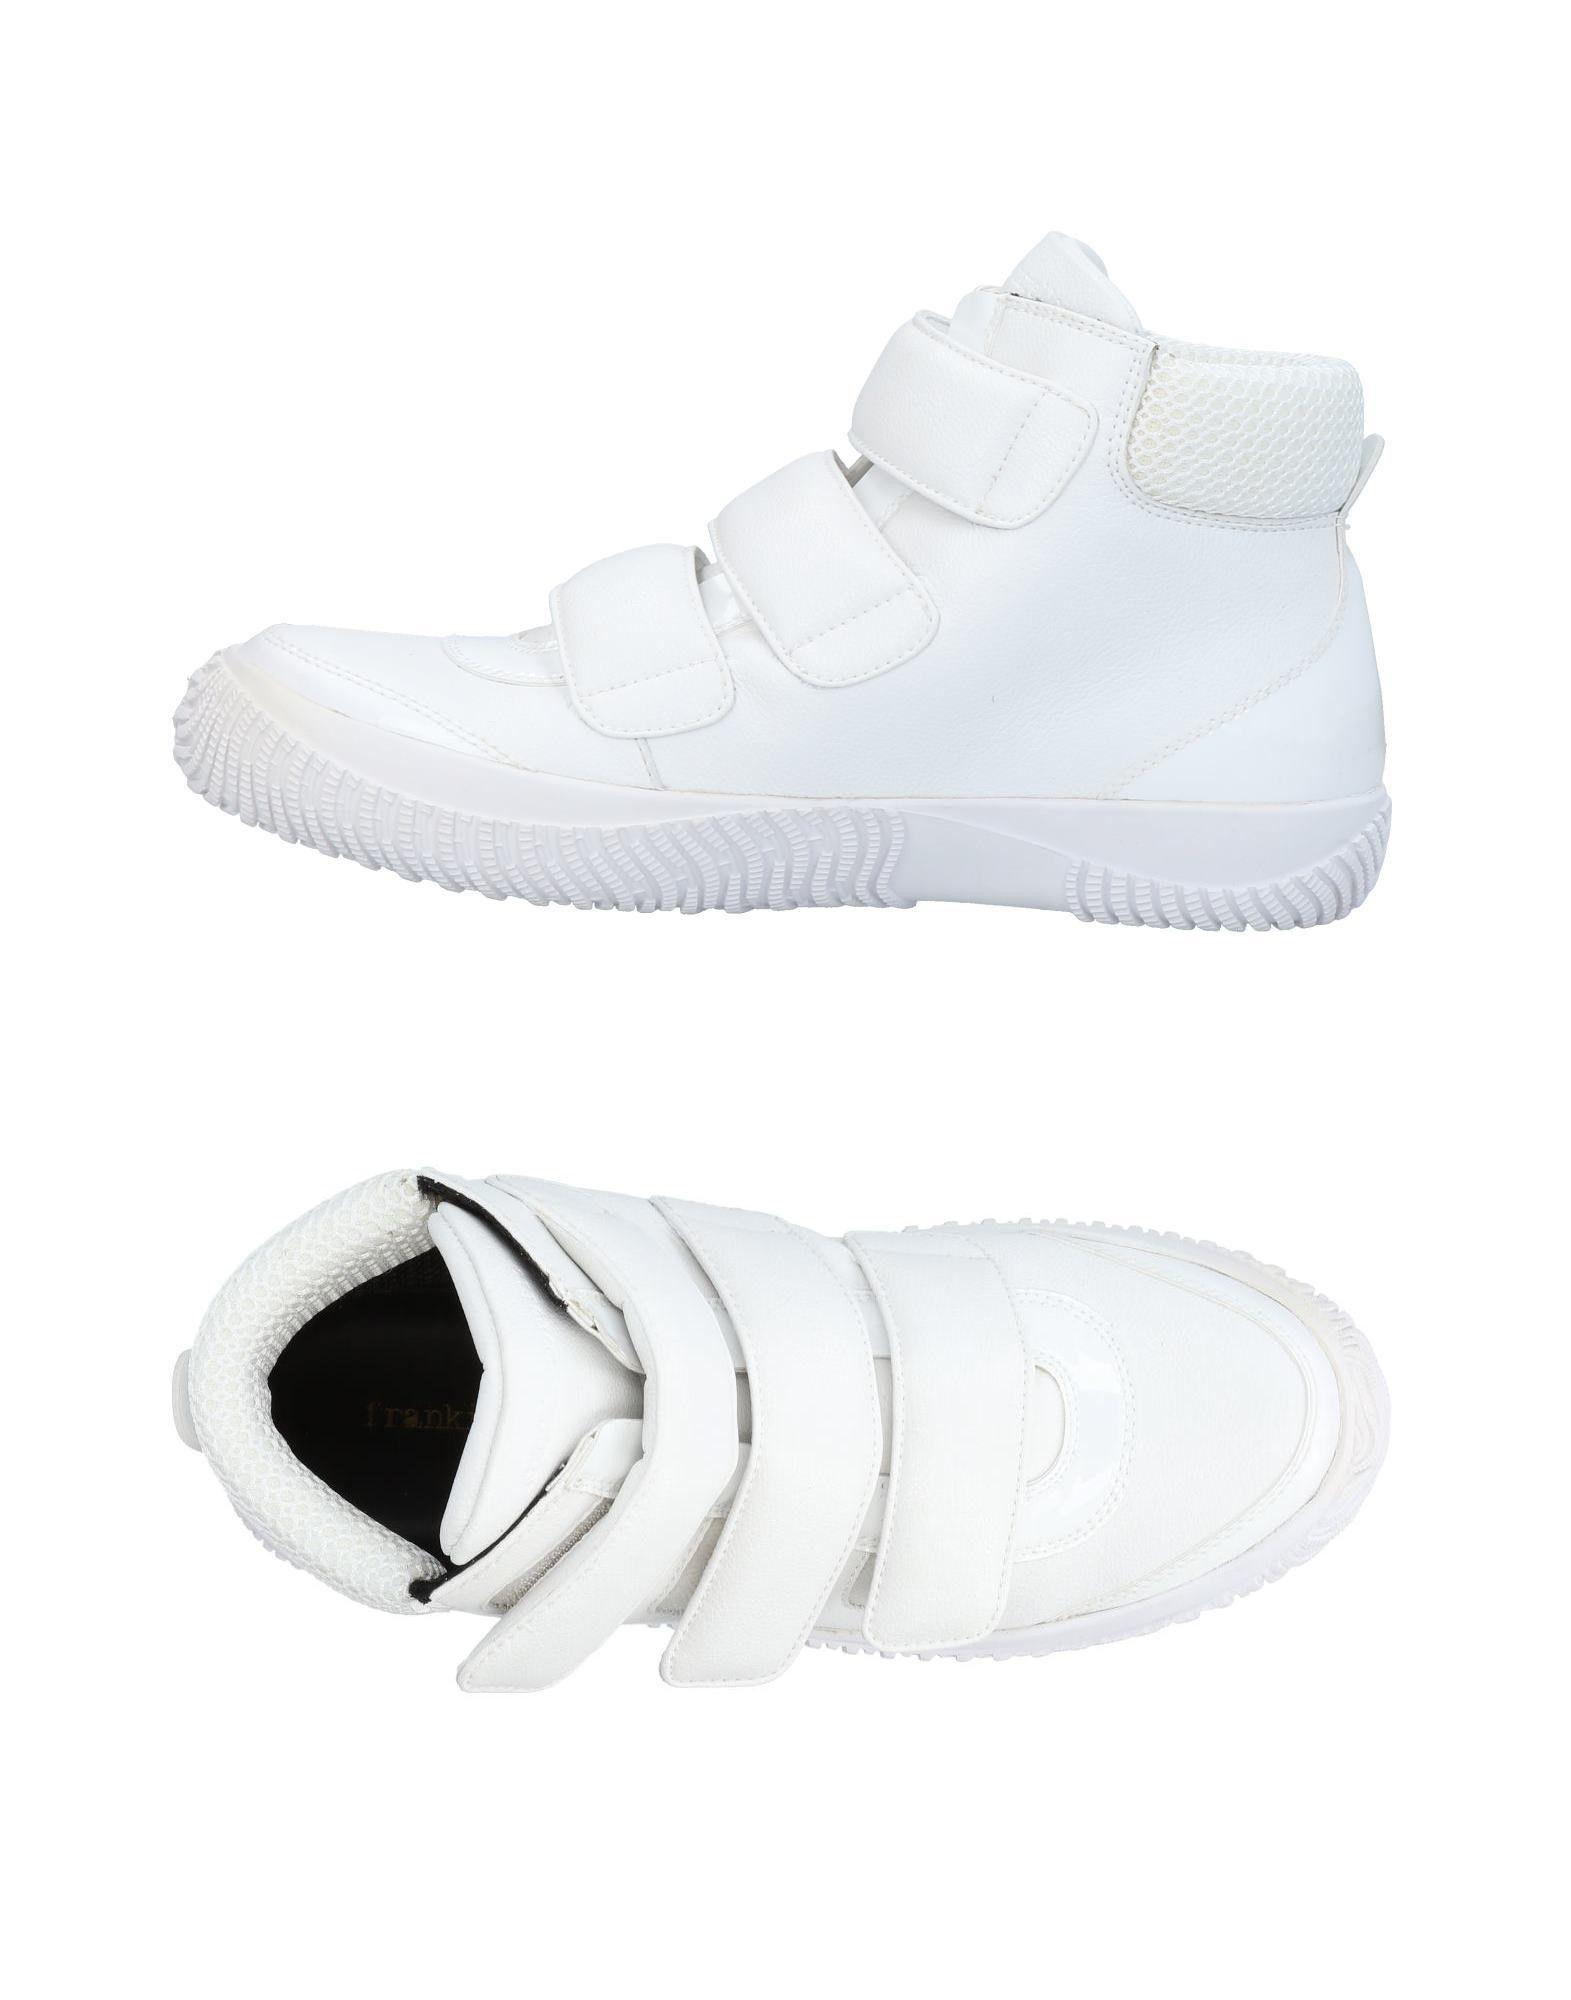 Sneakers Frankie Morello Homme - Sneakers Frankie Morello  Blanc Remise de marque